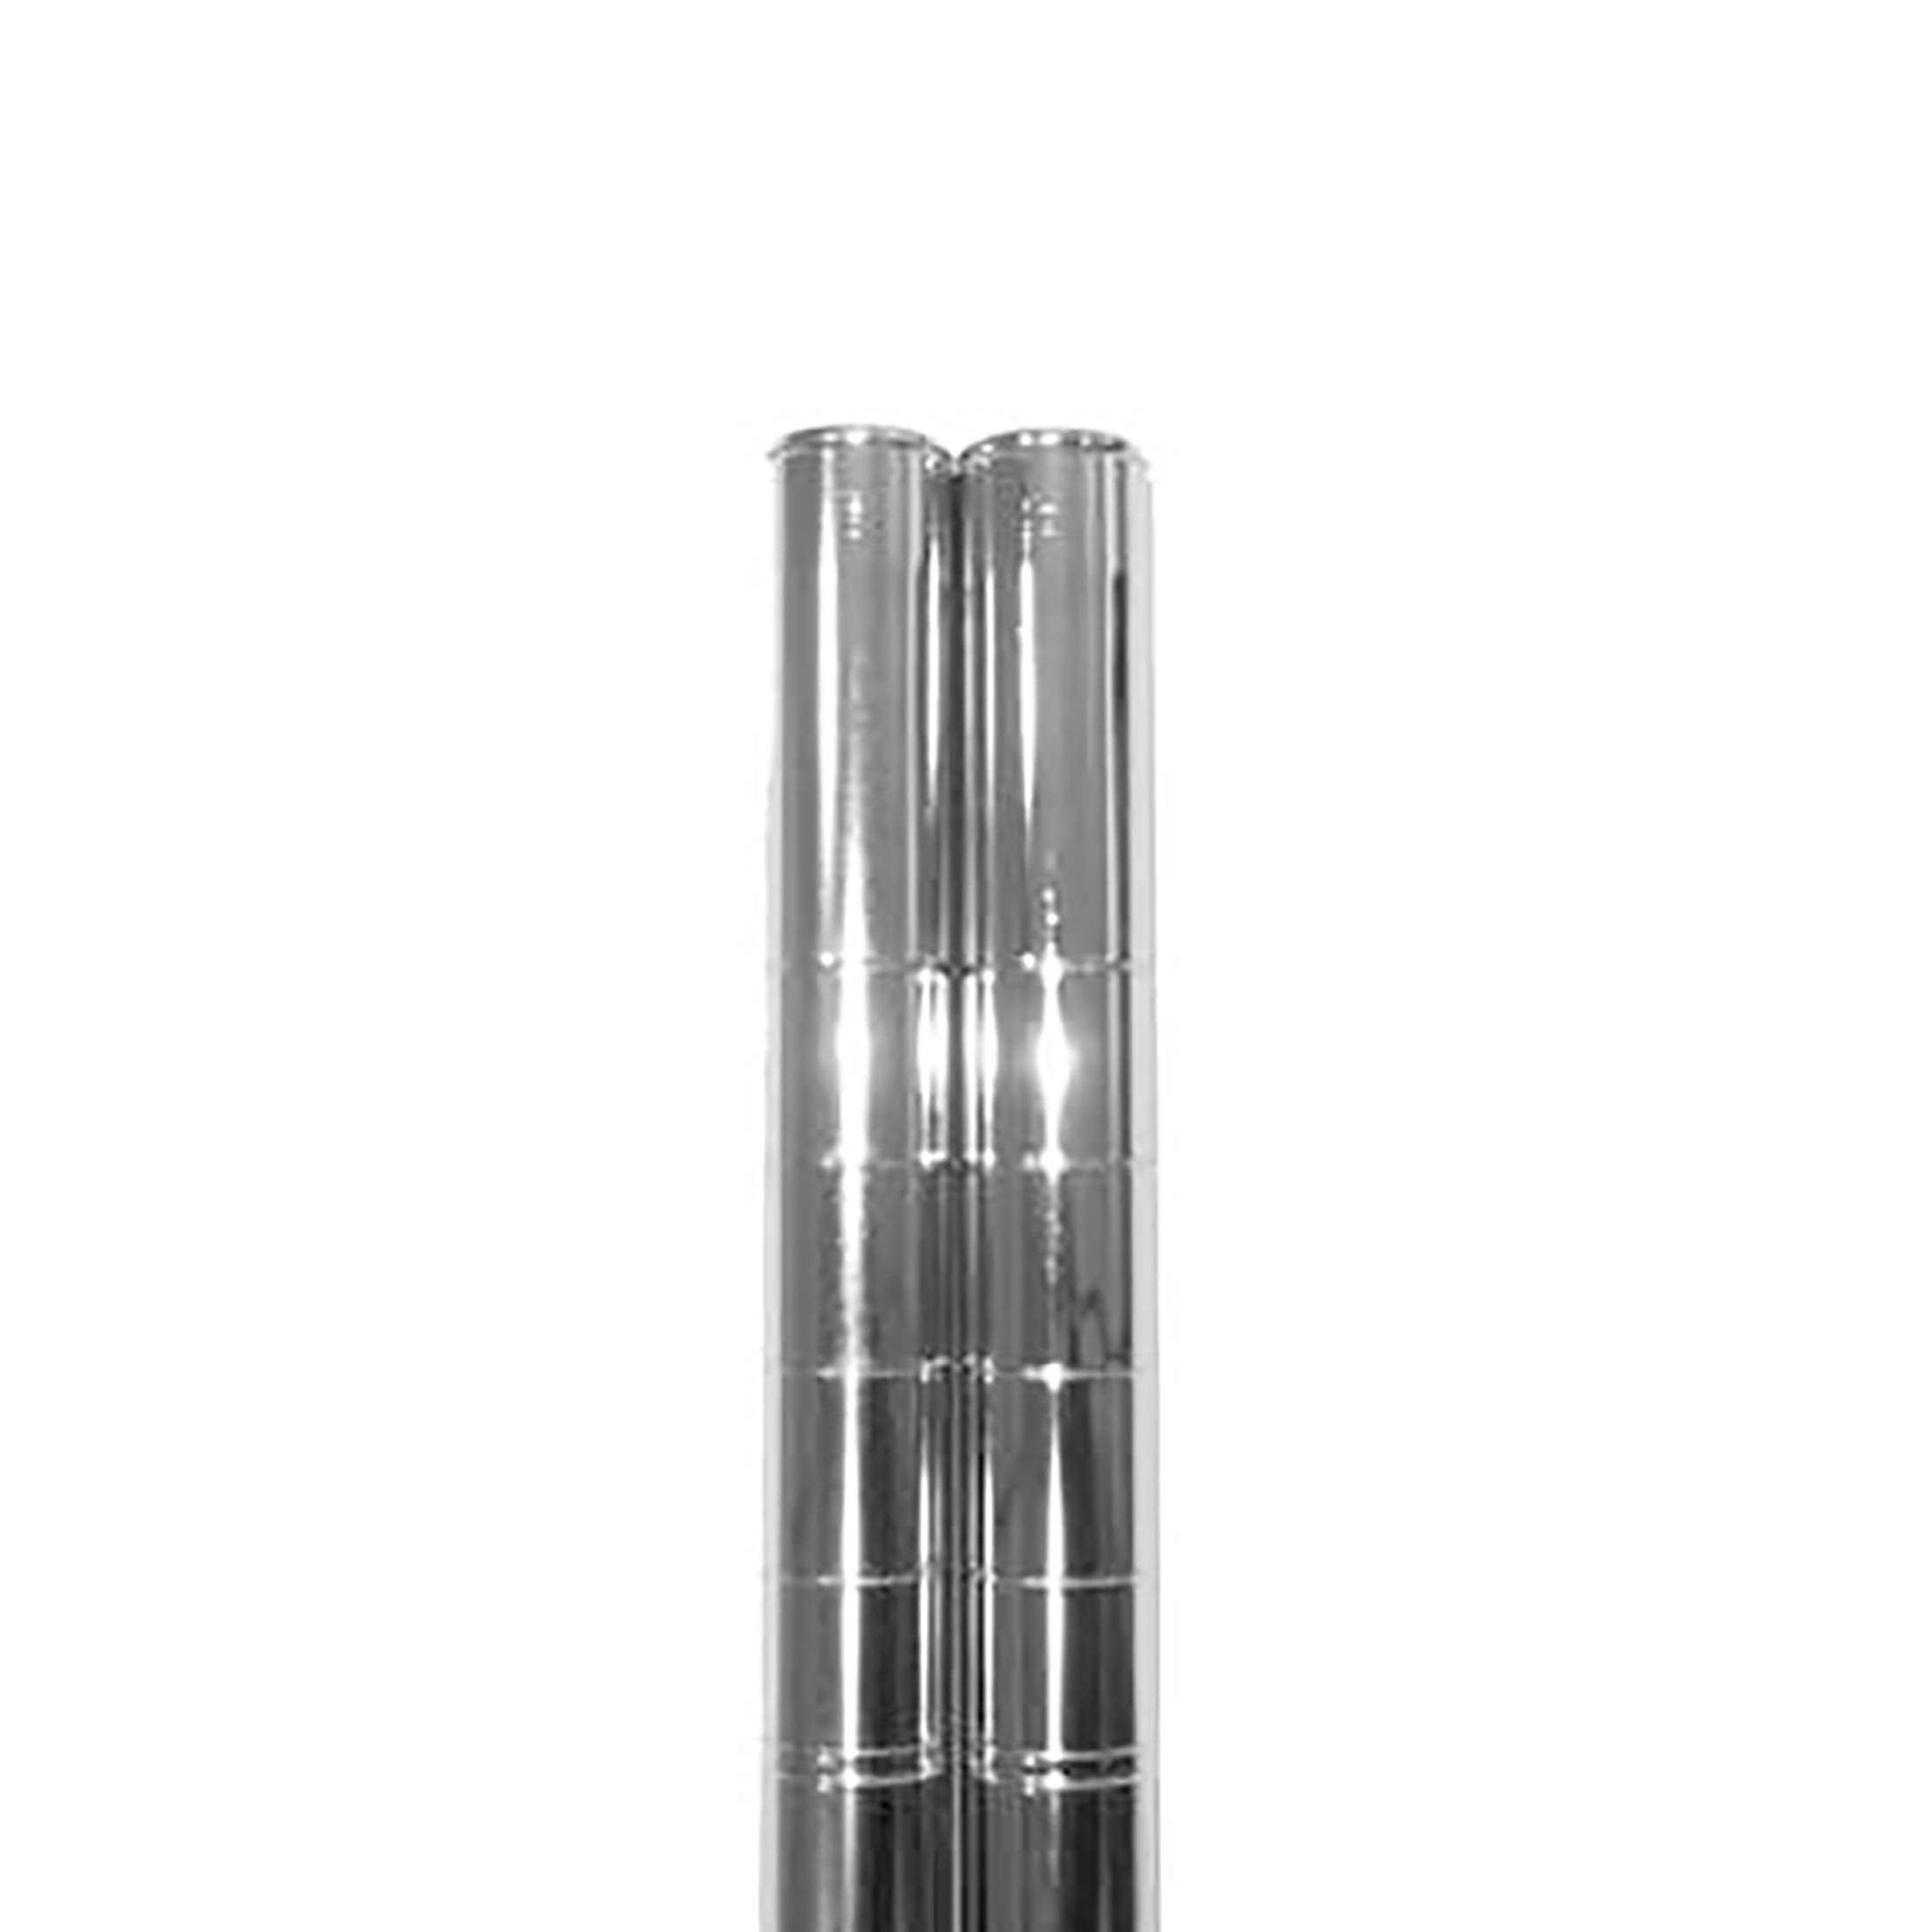 Seville Classics Ultradurable Commercial Grade Steel Shelving Poles 72 H X 1 Diameter Chrome Set Of 2 Amazon Ae